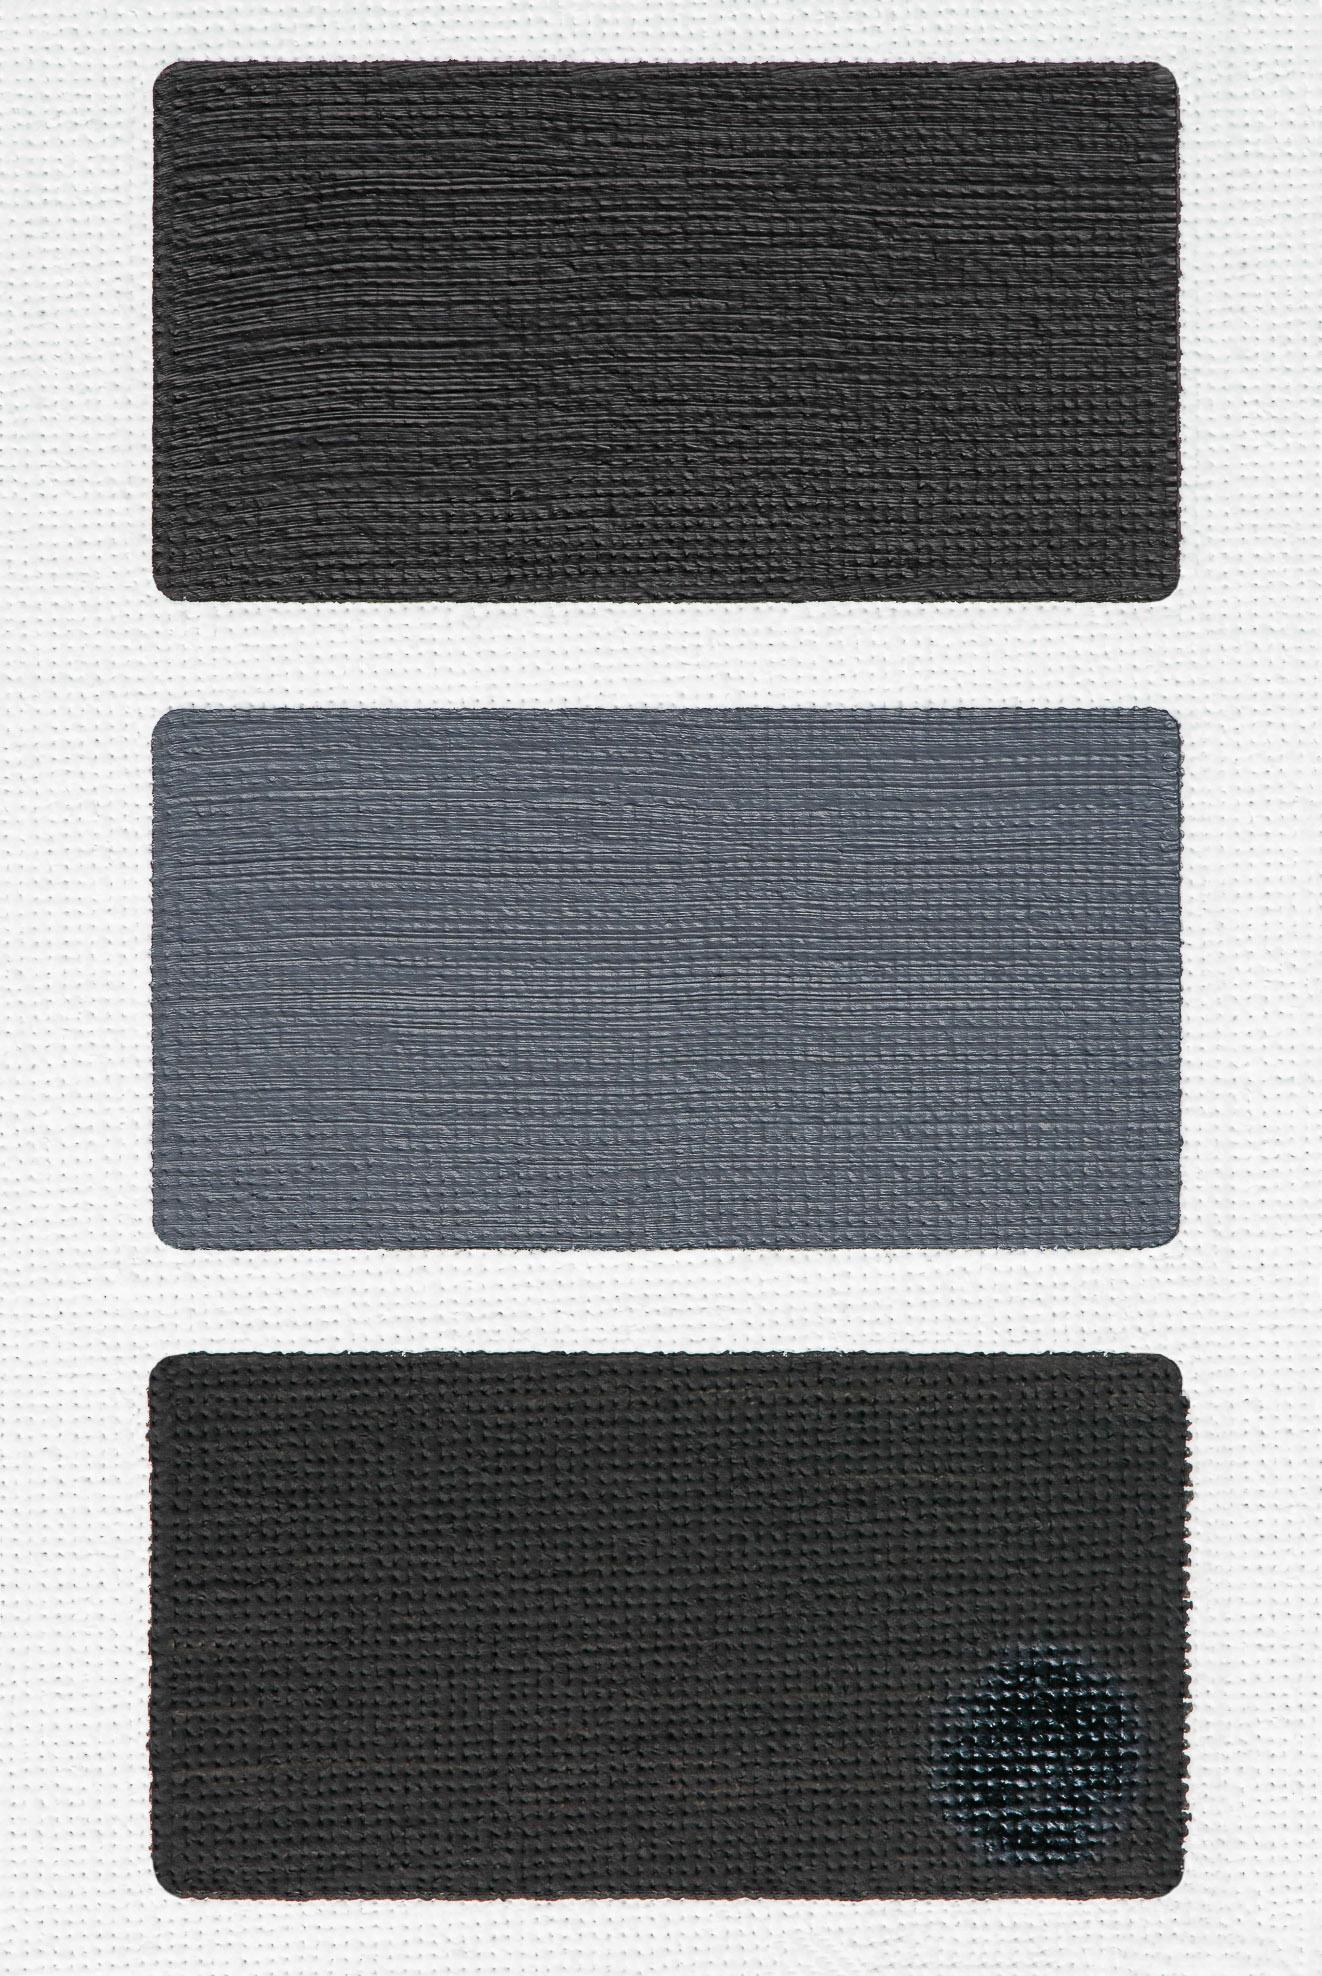 Ivory Black Vs Lamp Black : ivory, black, Winsor, Newton, Artists', Colors:, Ivory, Black, MacKendrew